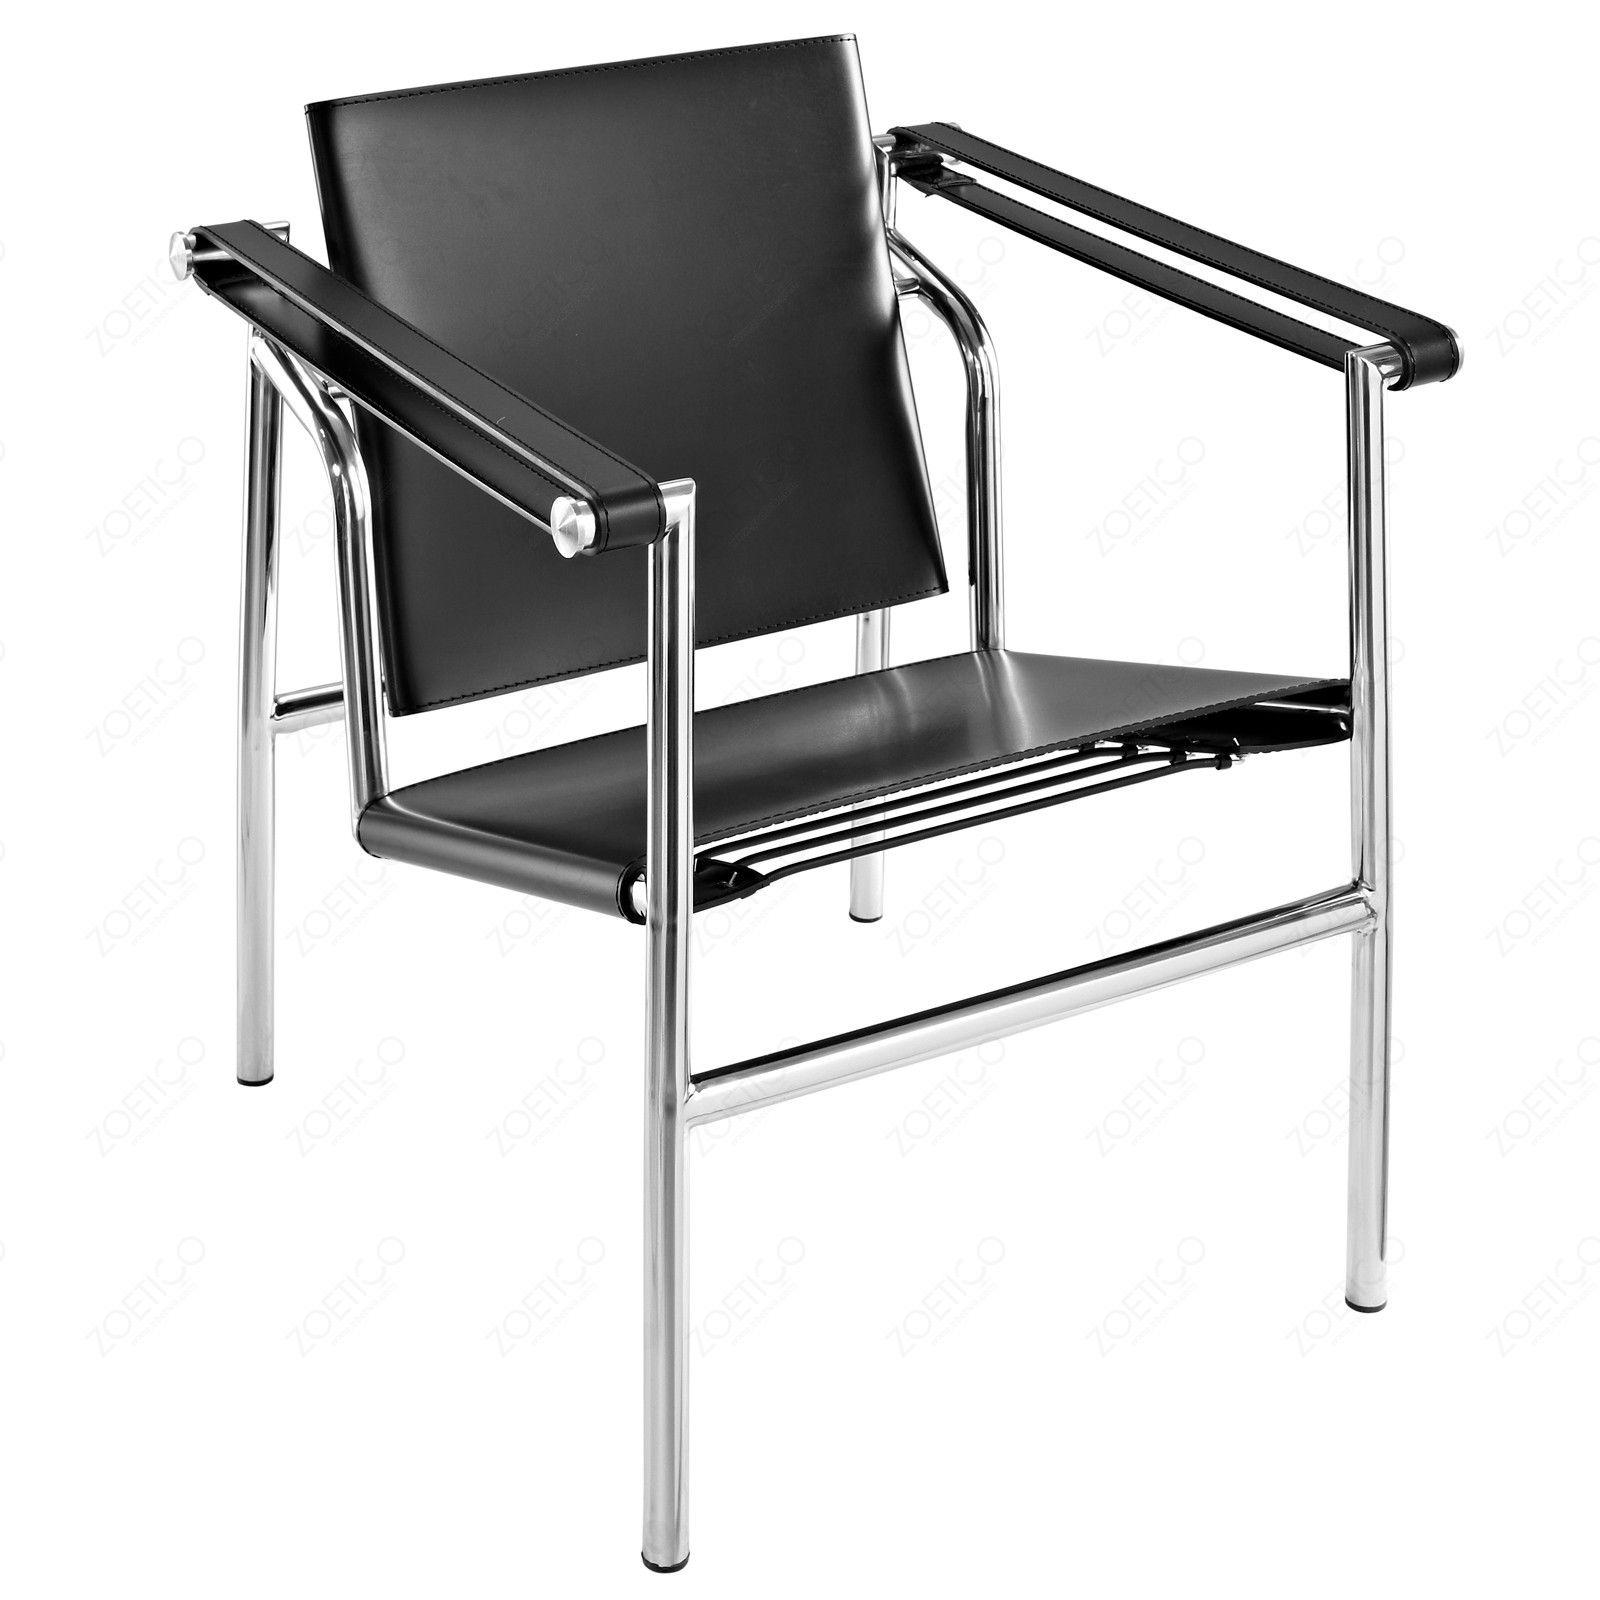 Lc1 (Sling Chair, Metal Frame) Design Le Corbusier, Pierre Jeanneret,